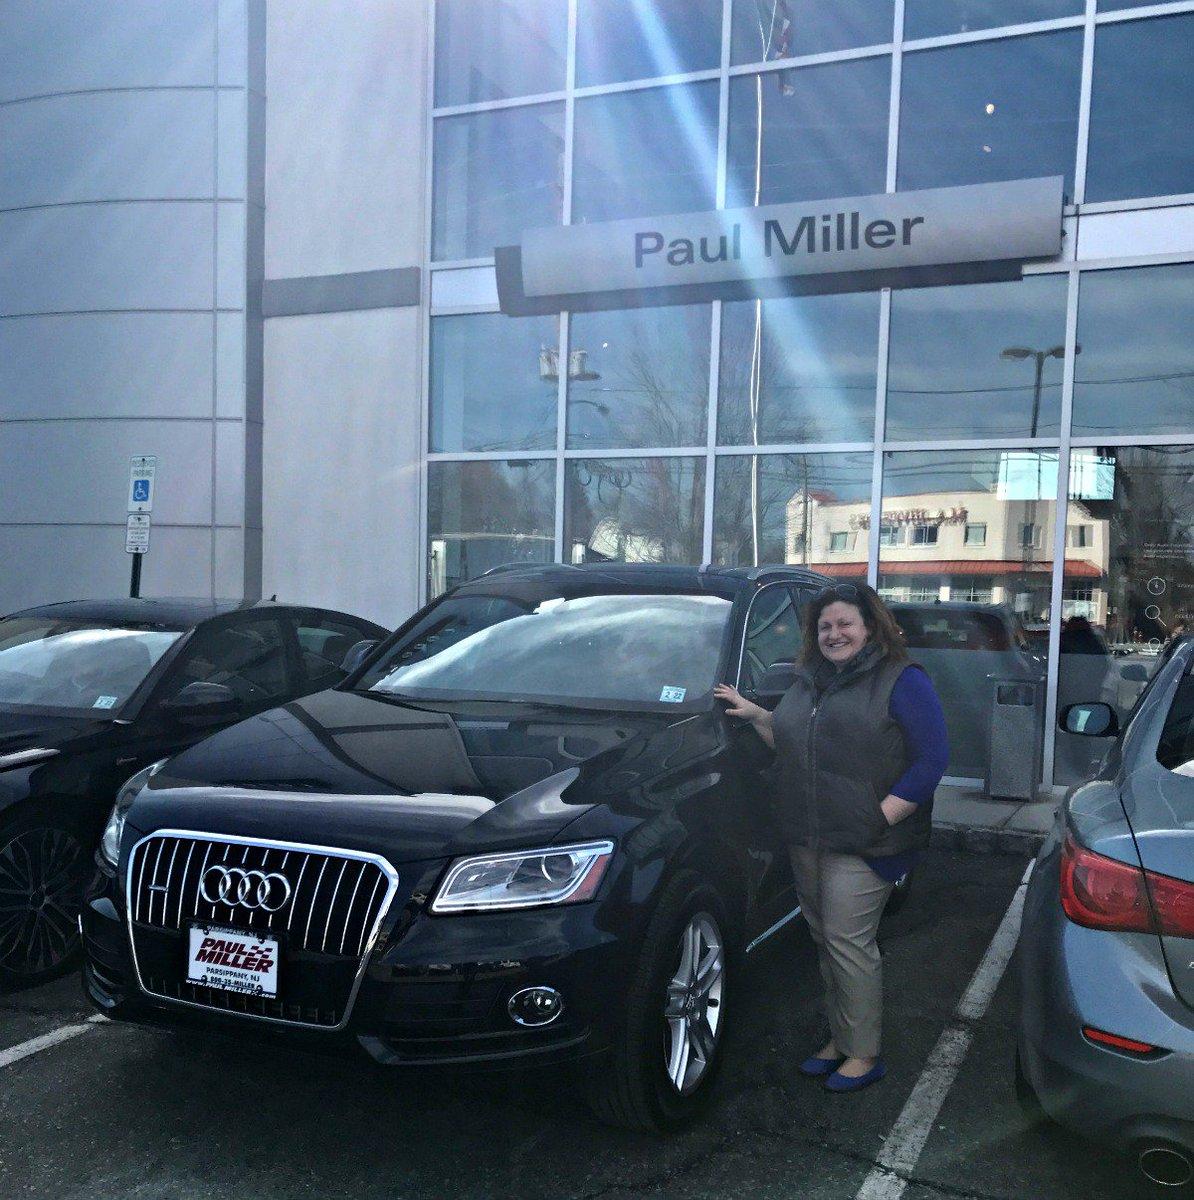 Paul Miller Audi On Twitter Theresa S From Lake Hopatcong - Paul miller audi